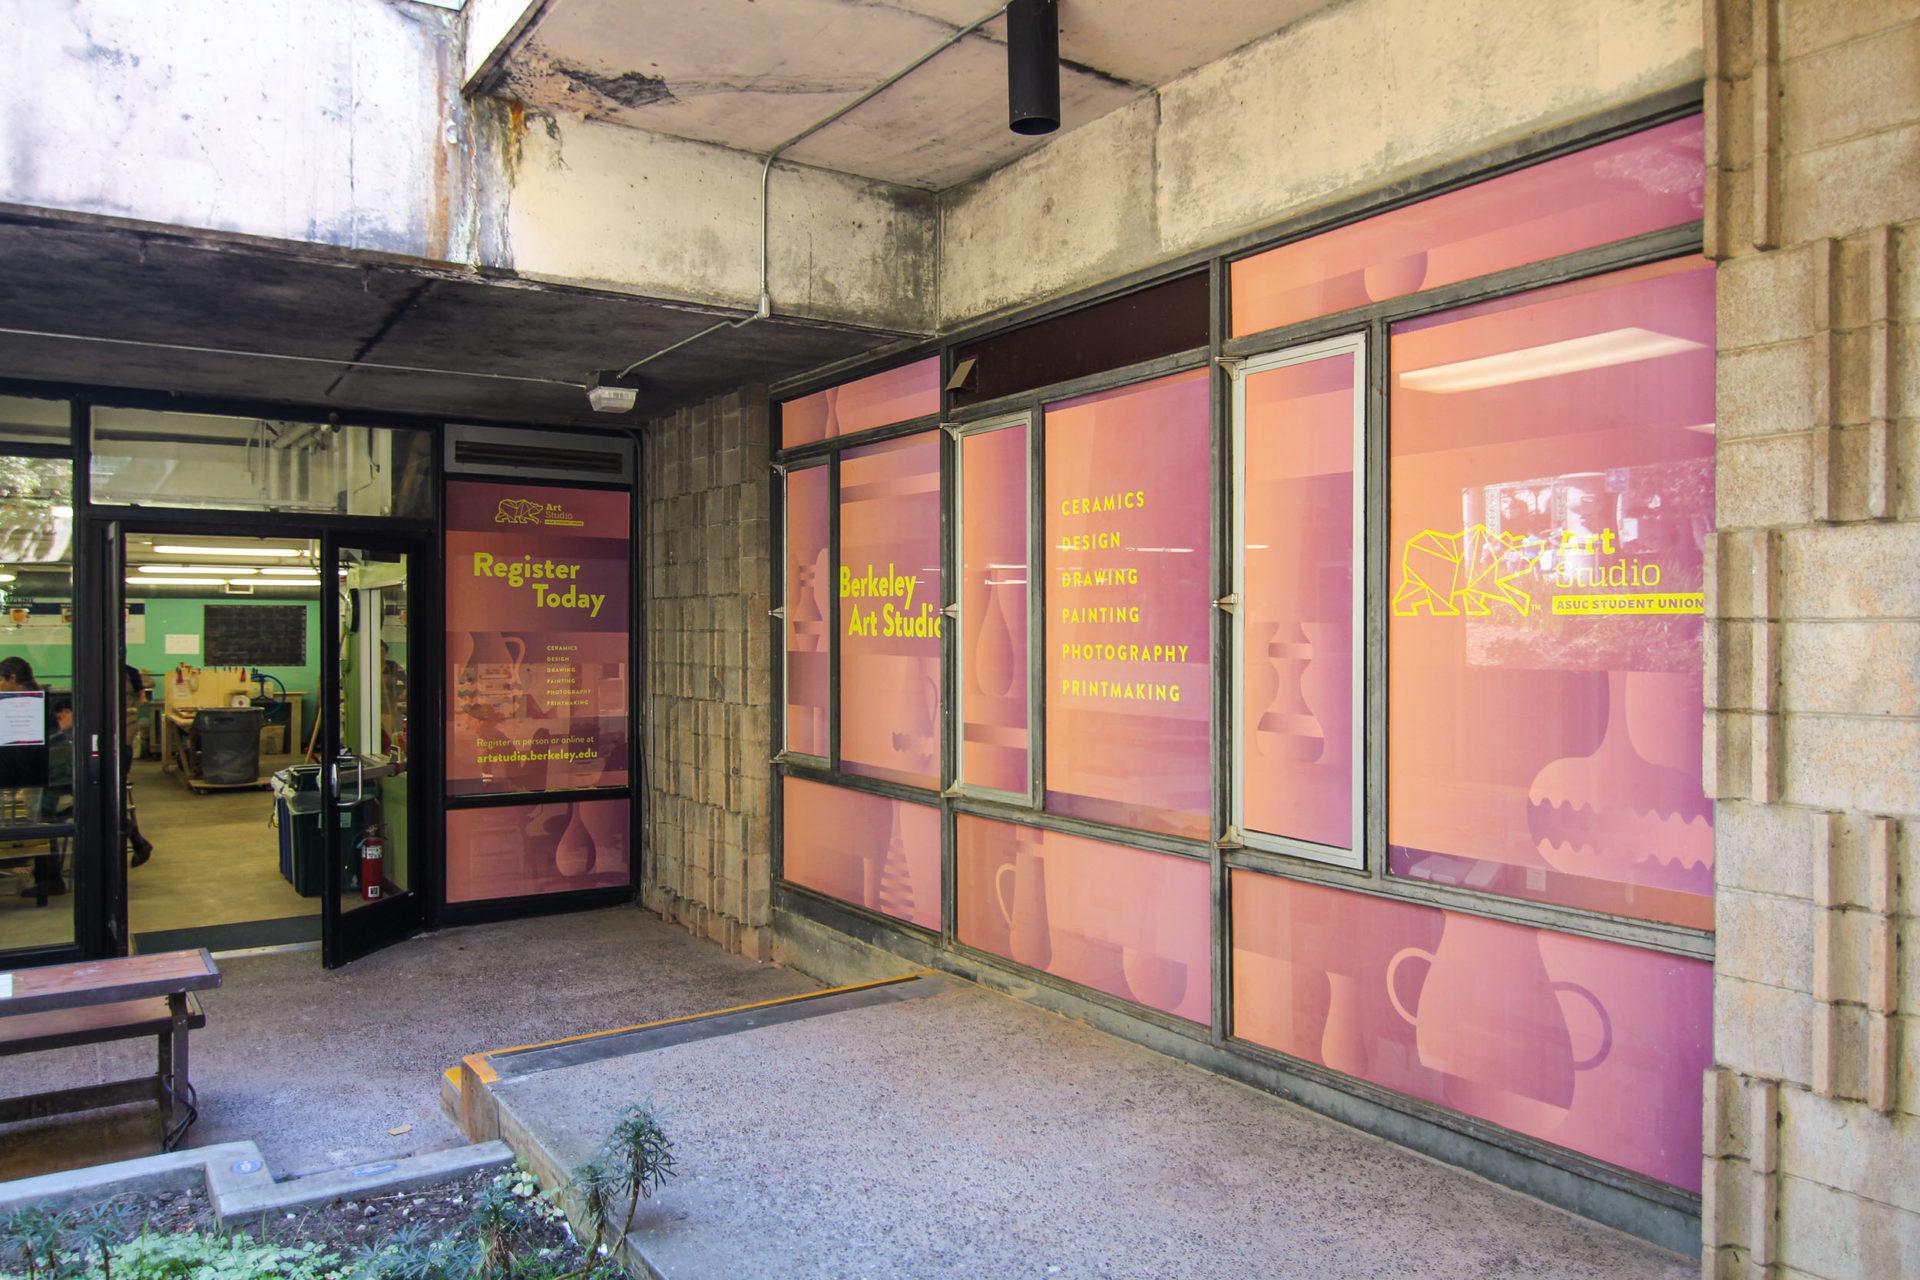 Design for Berkeley Art Studio promotional signage.